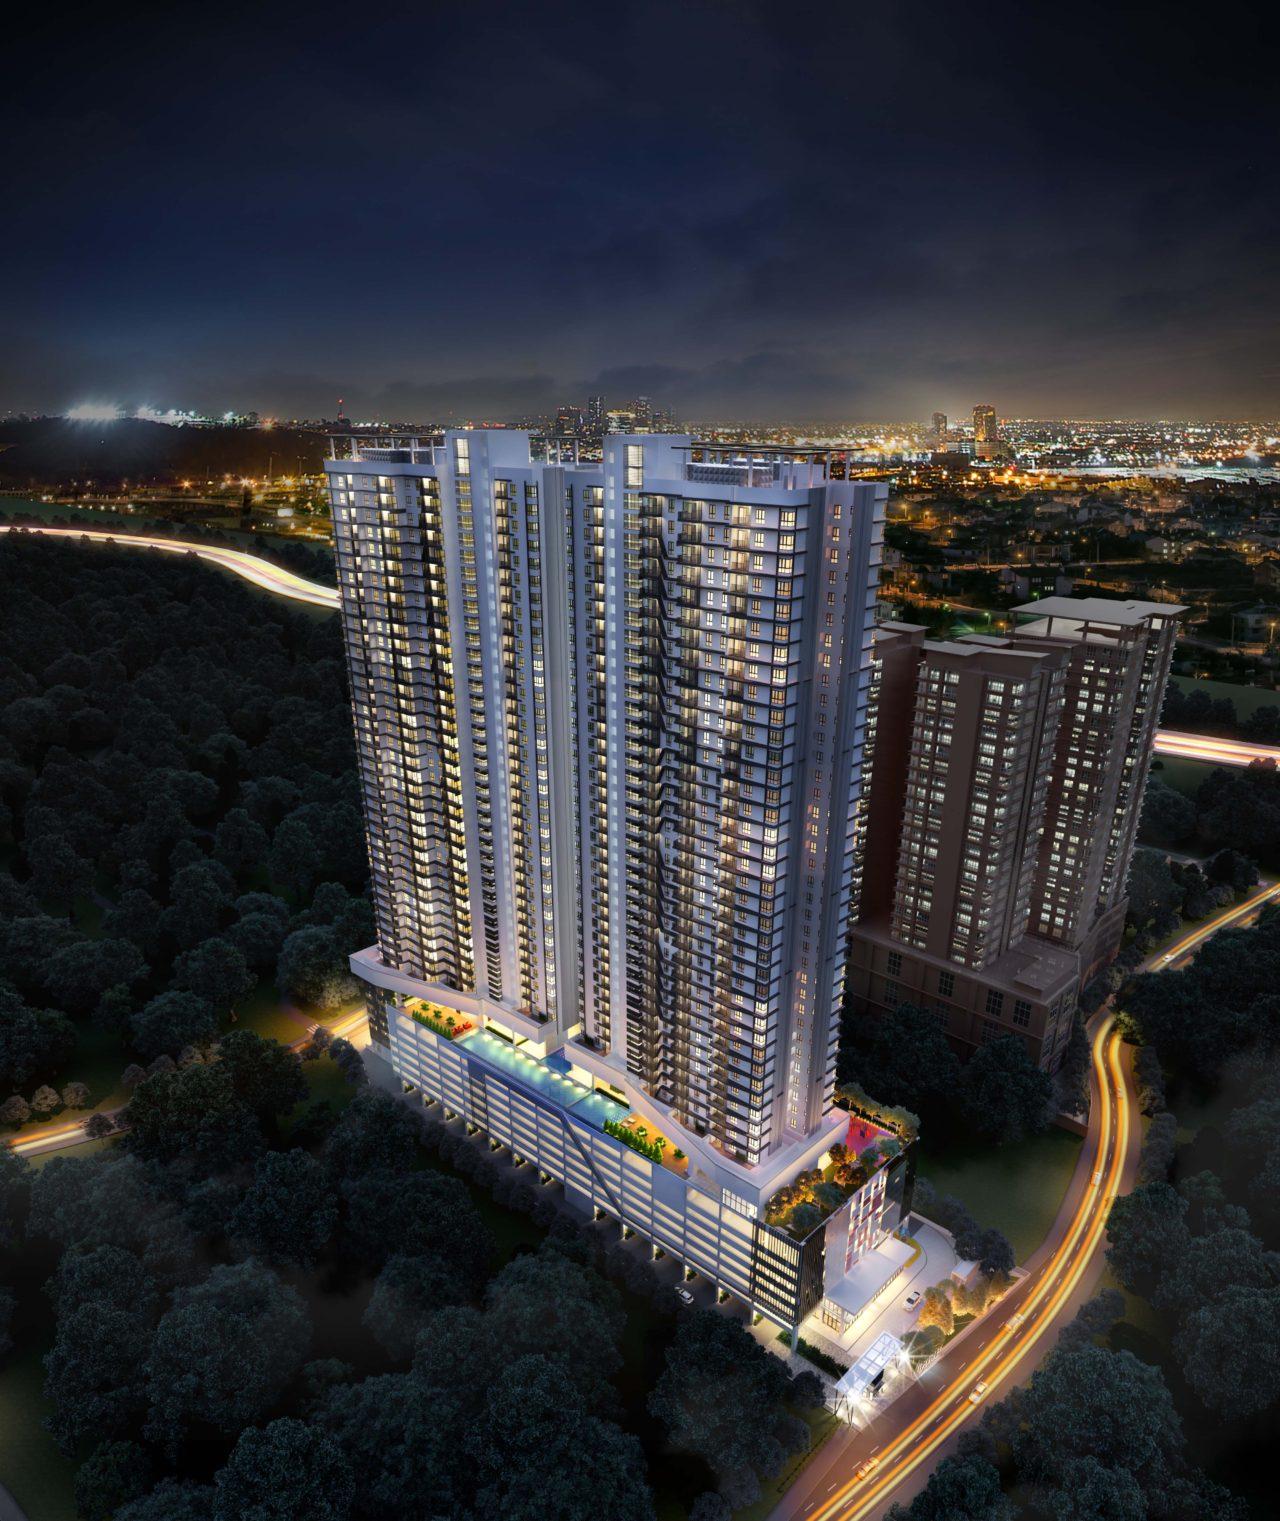 Night view of Inspirasi MK